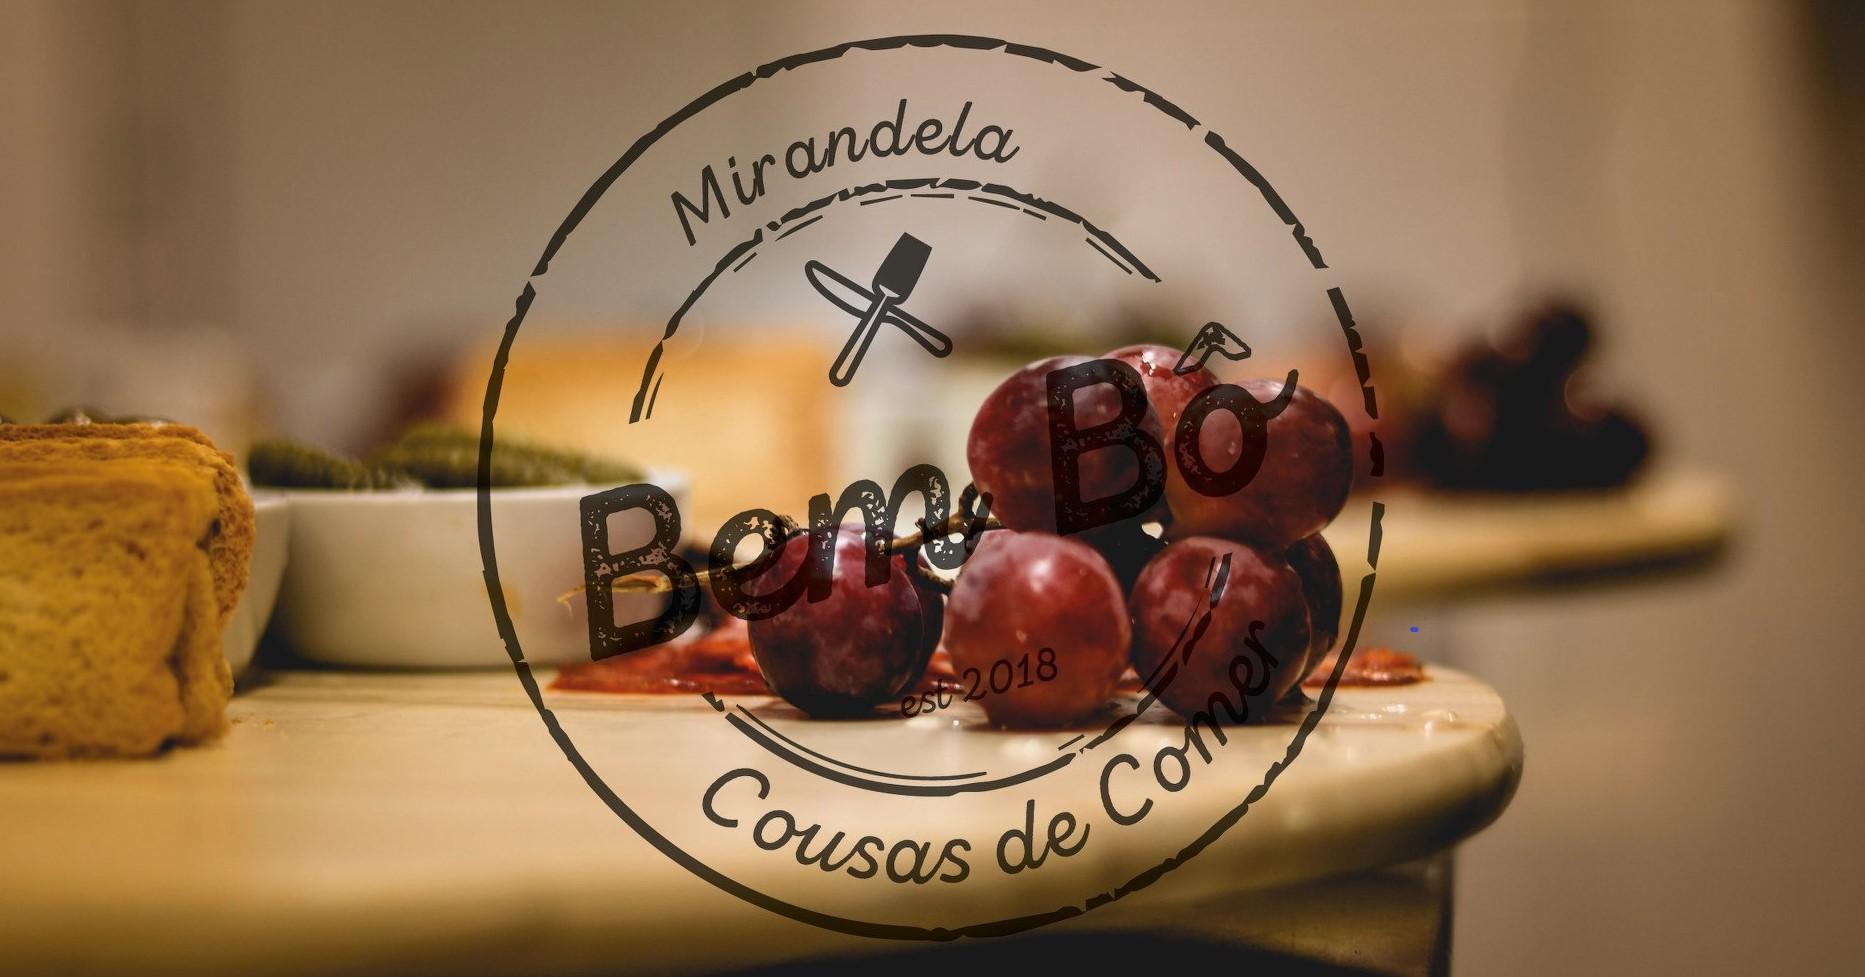 Logo Restaurante Bem bô Mirandela